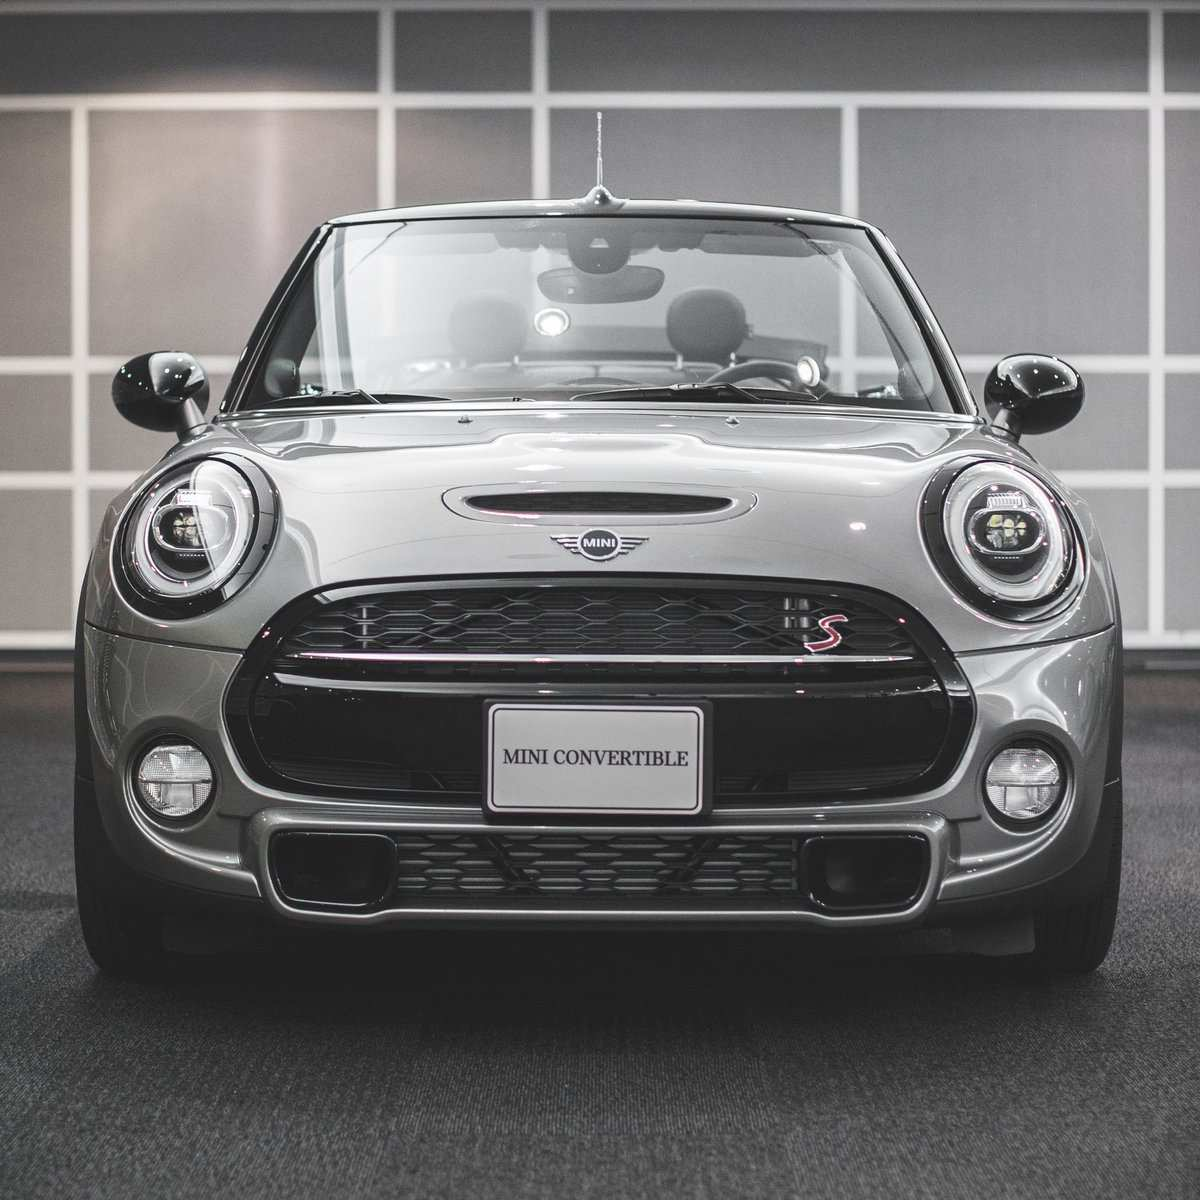 72 Great 2019 Mini Usa First Drive for 2019 Mini Usa